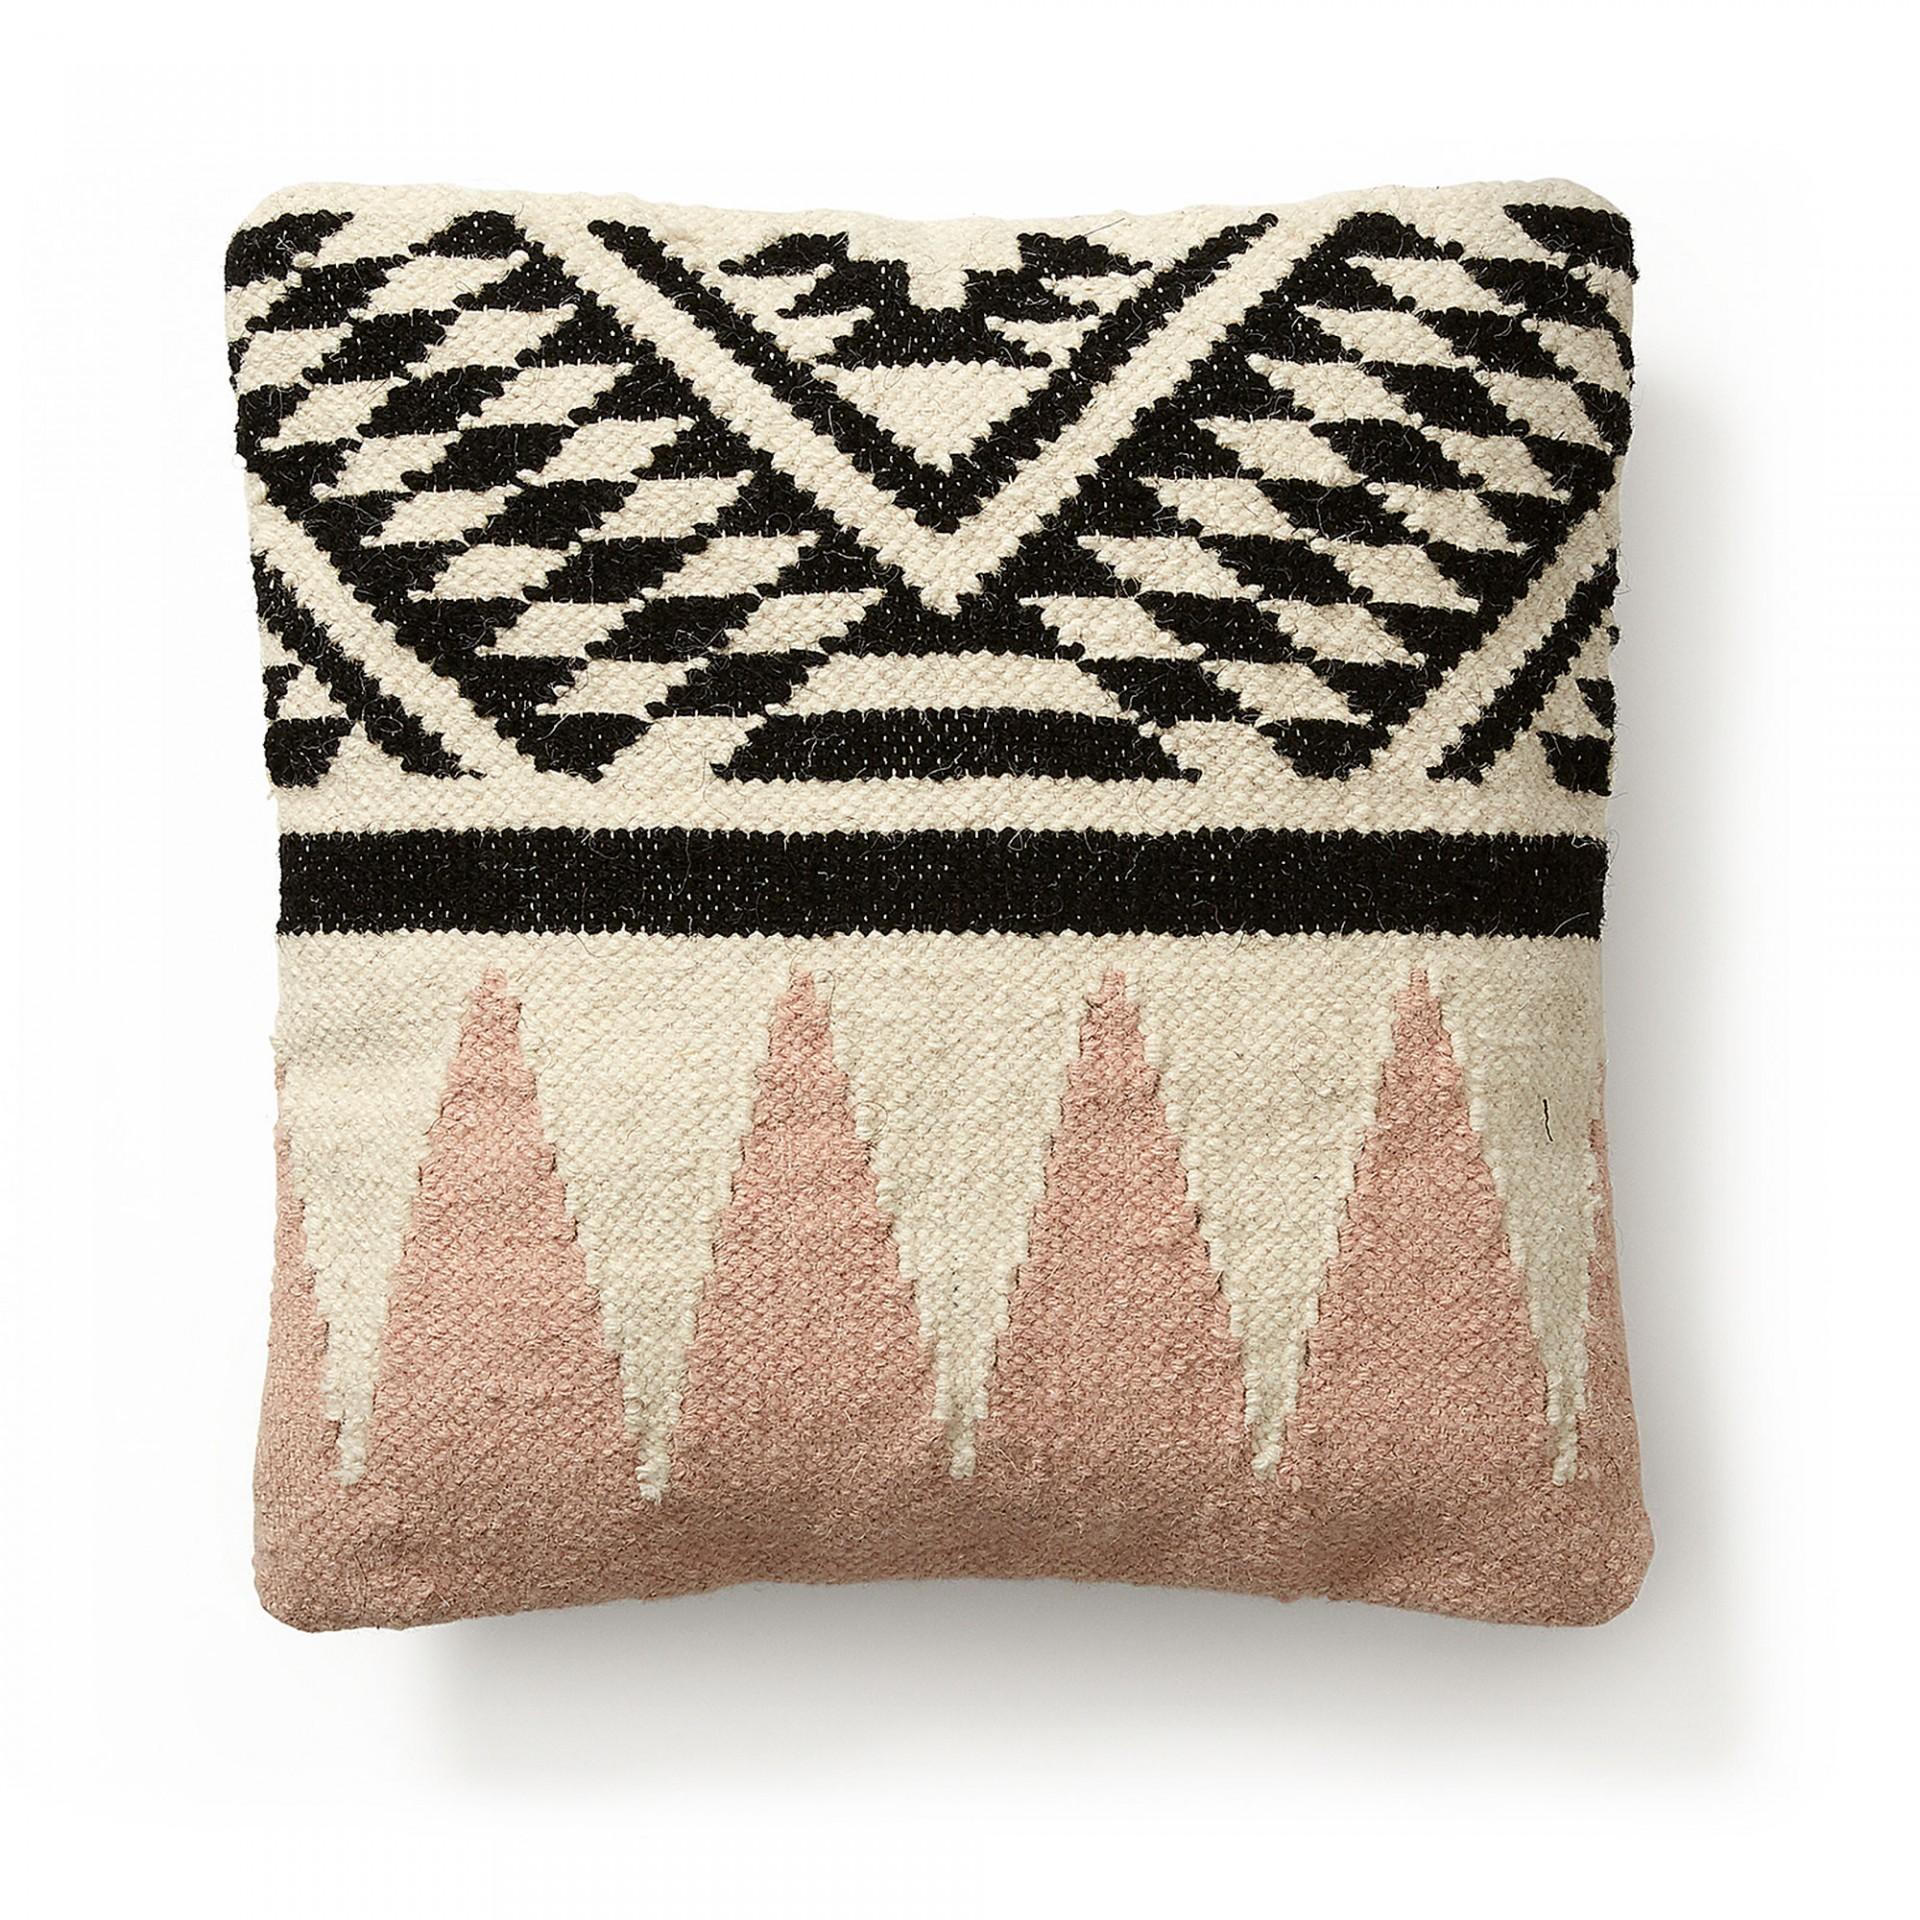 Capa de almofada Fred, algodão, multicolor, 45x45